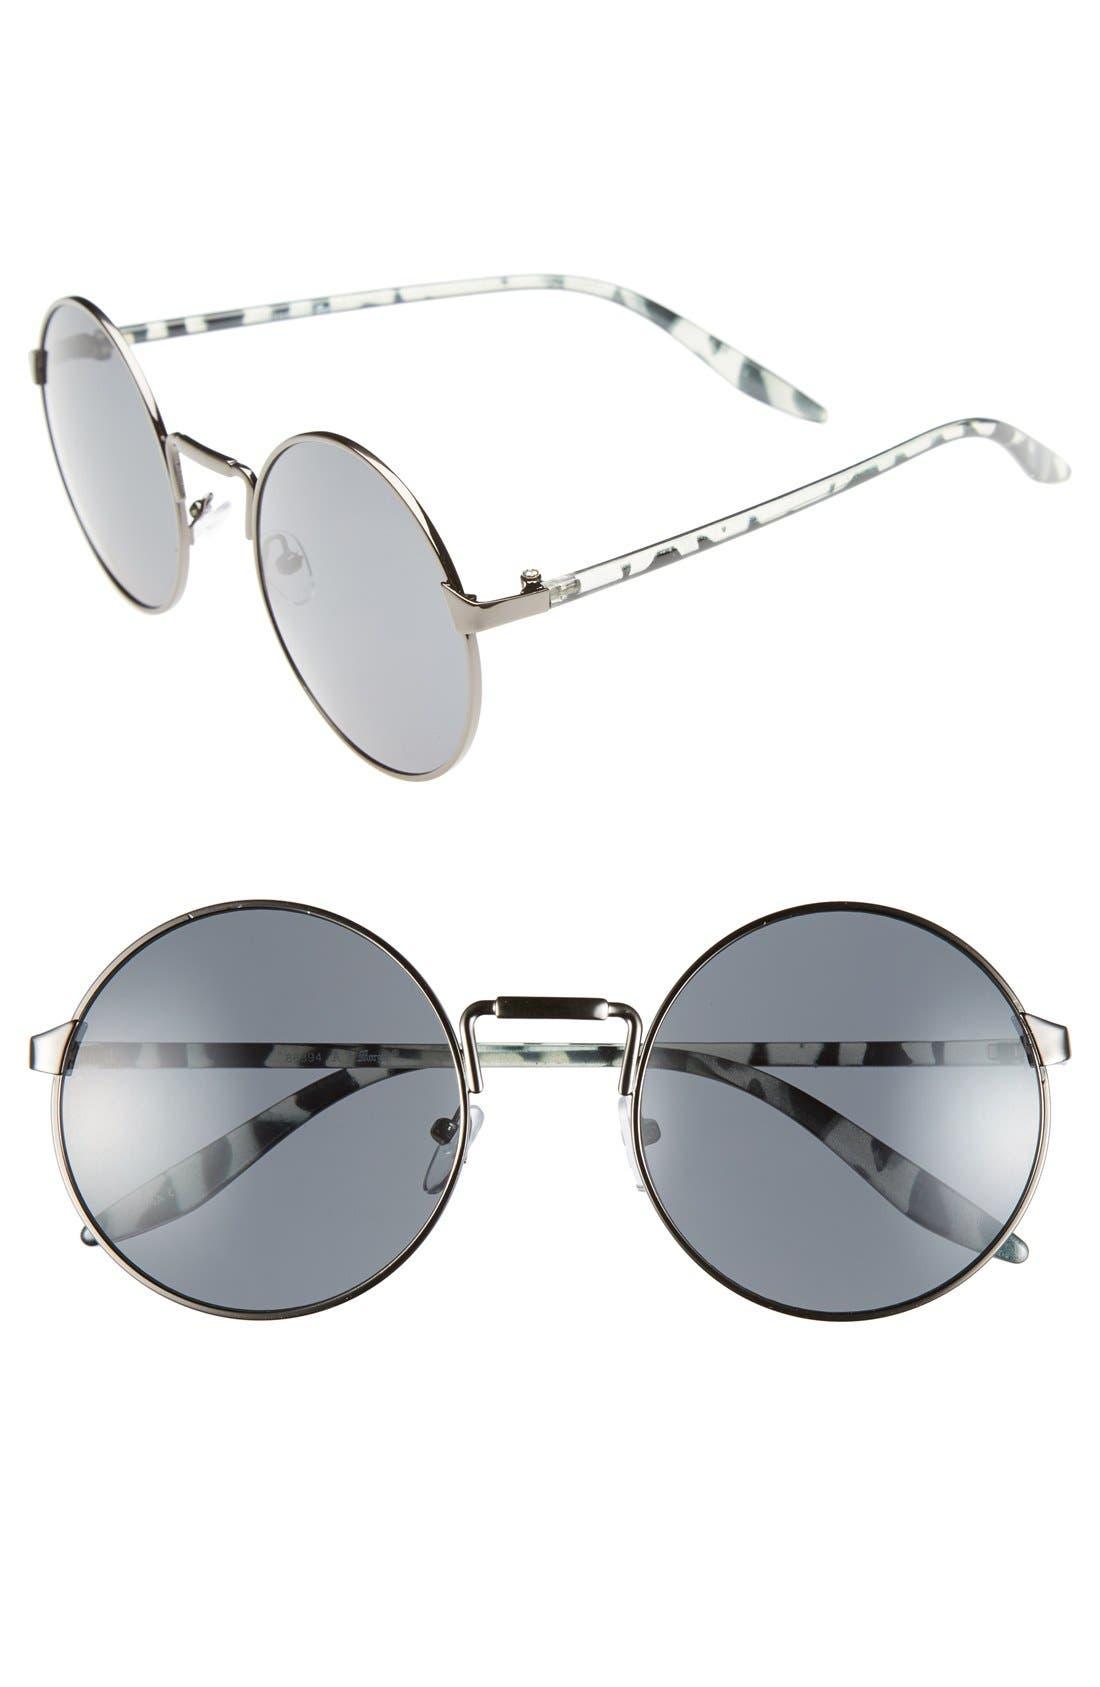 Alternate Image 1 Selected - A.J. Morgan 'Spot' 52mm Sunglasses